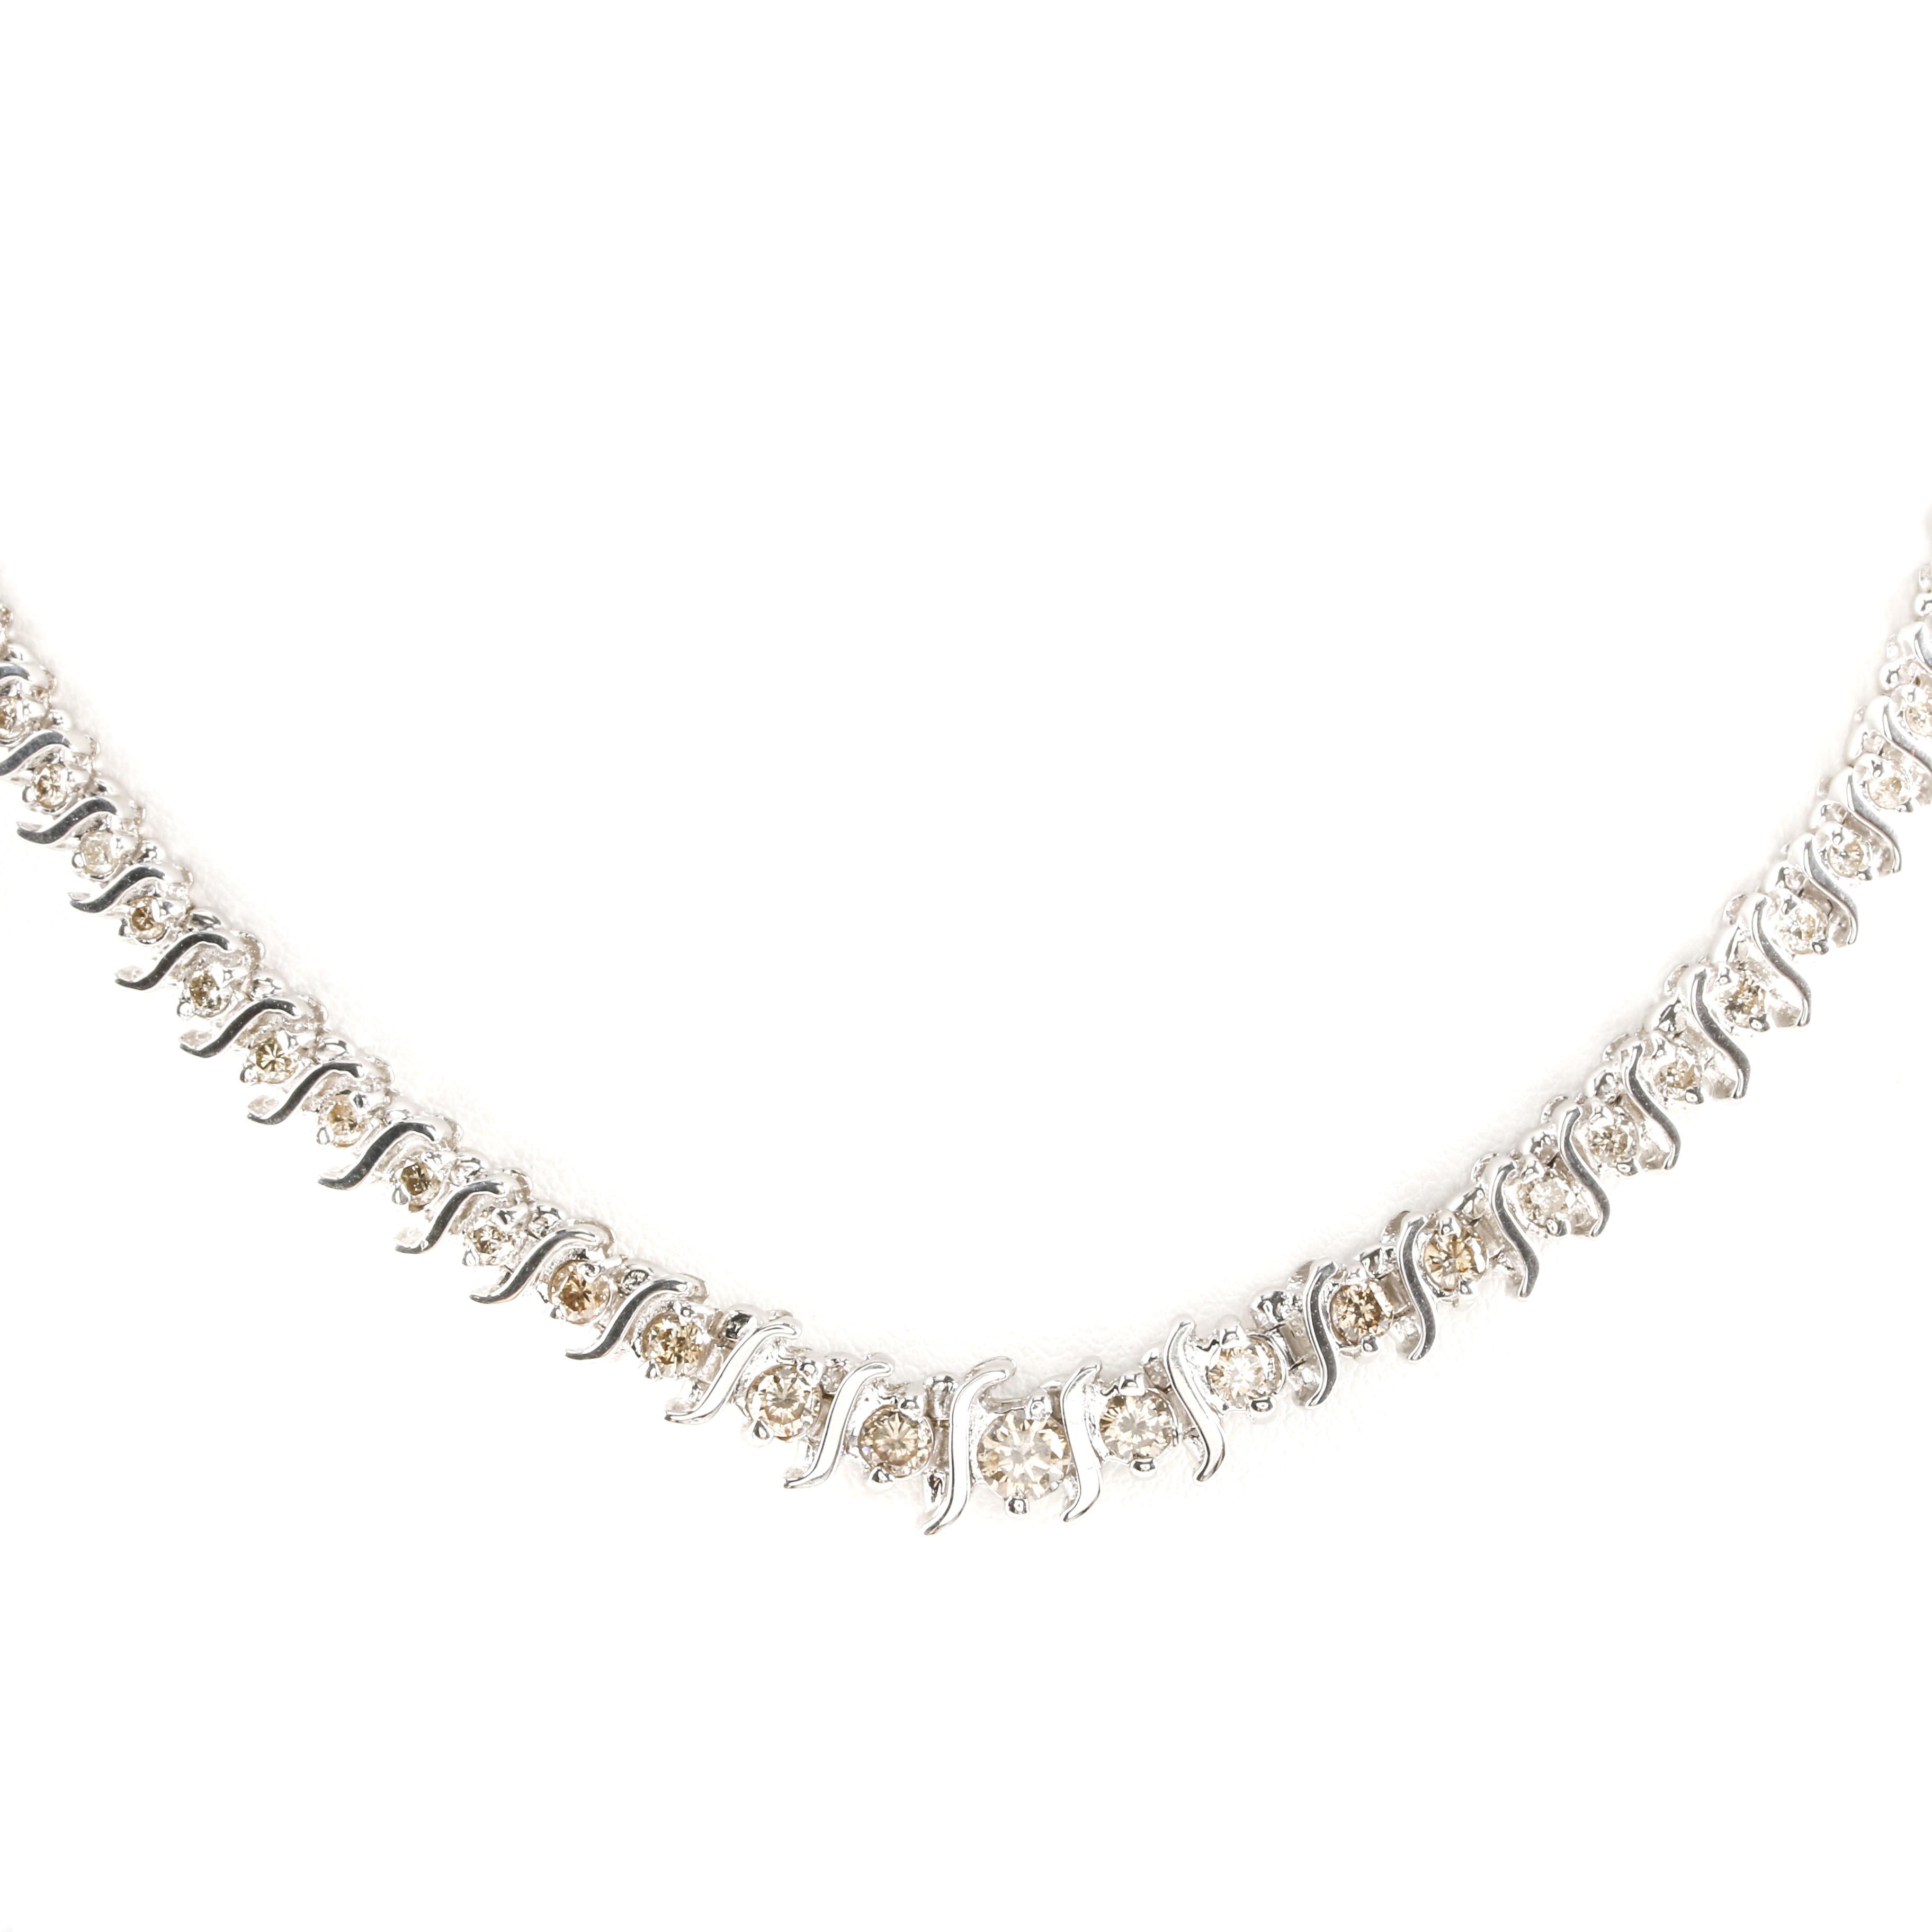 14K White Gold 4.03 CTW Diamond Necklace